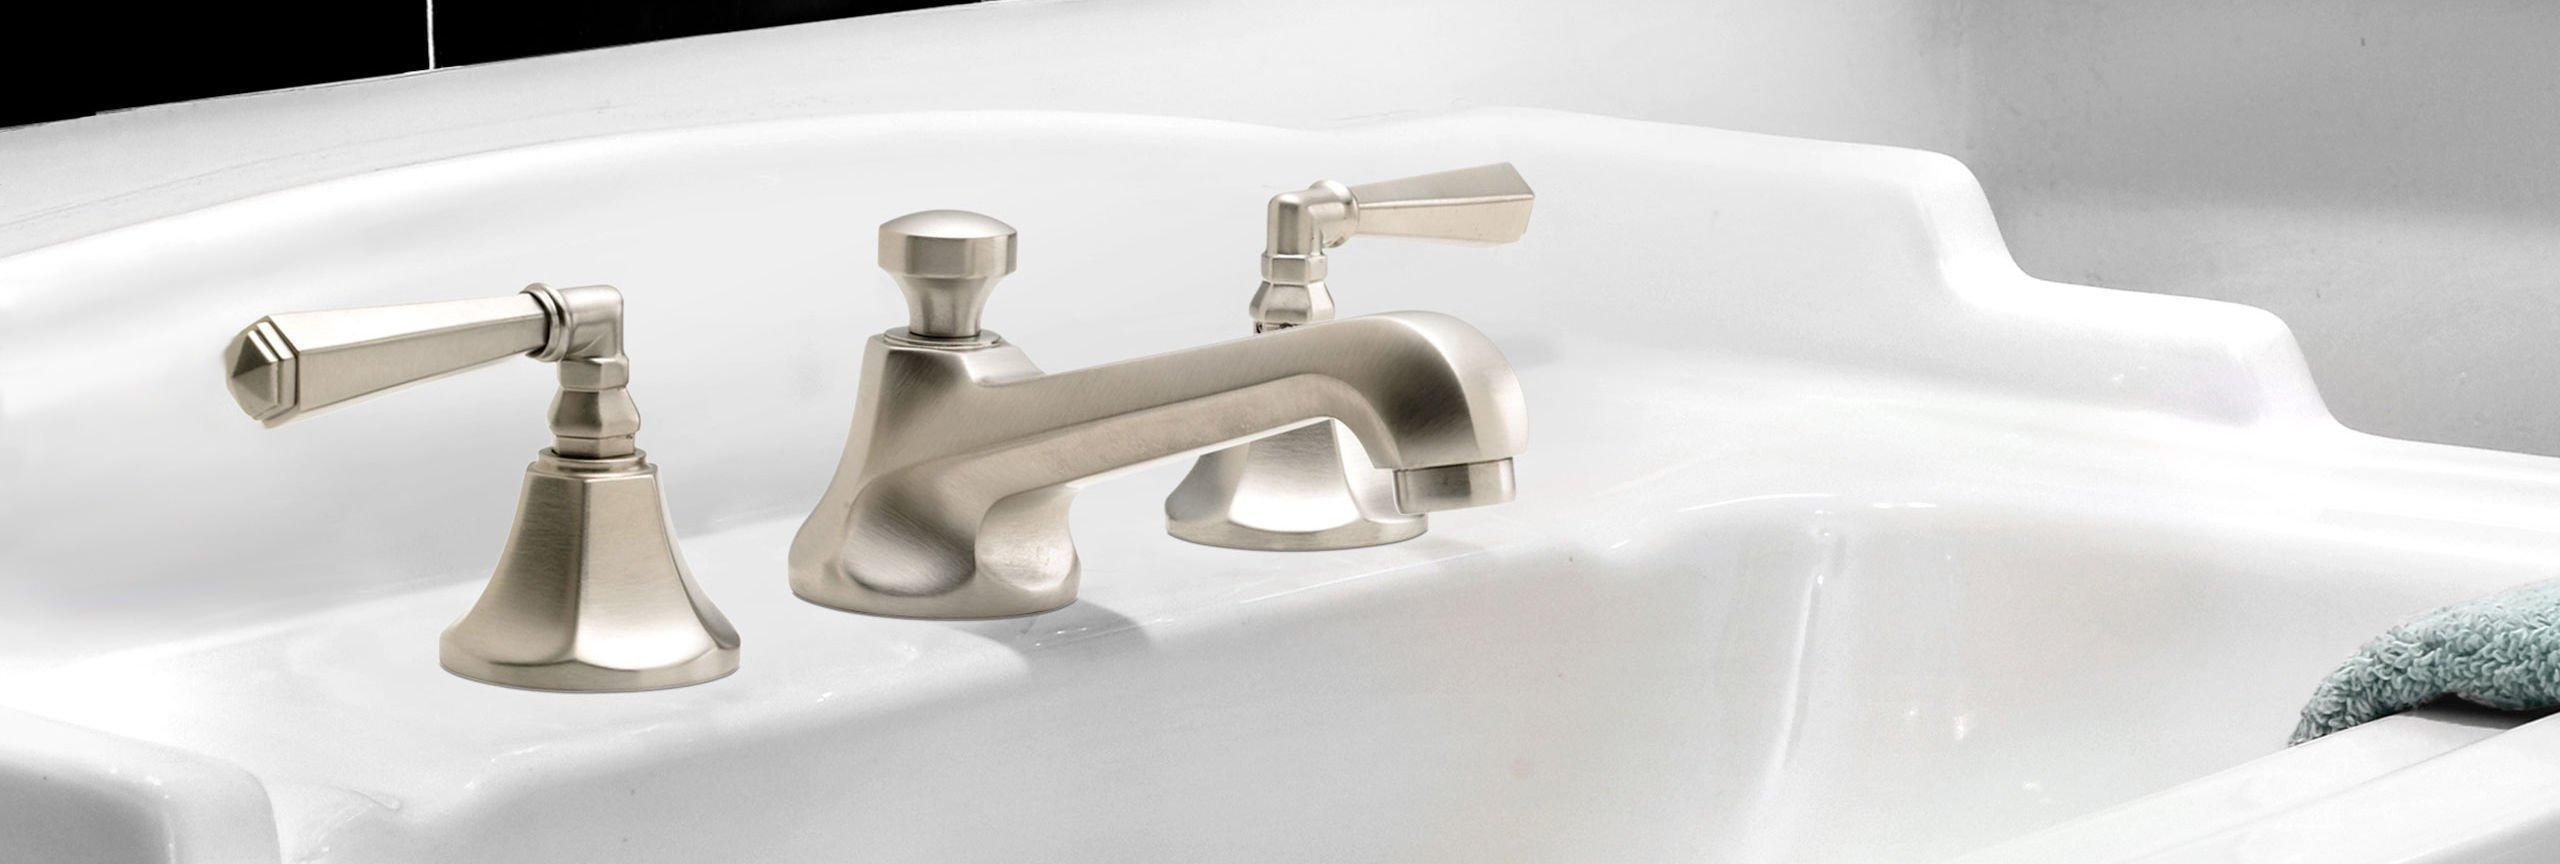 Bathroom series monterey widespread faucet on sink